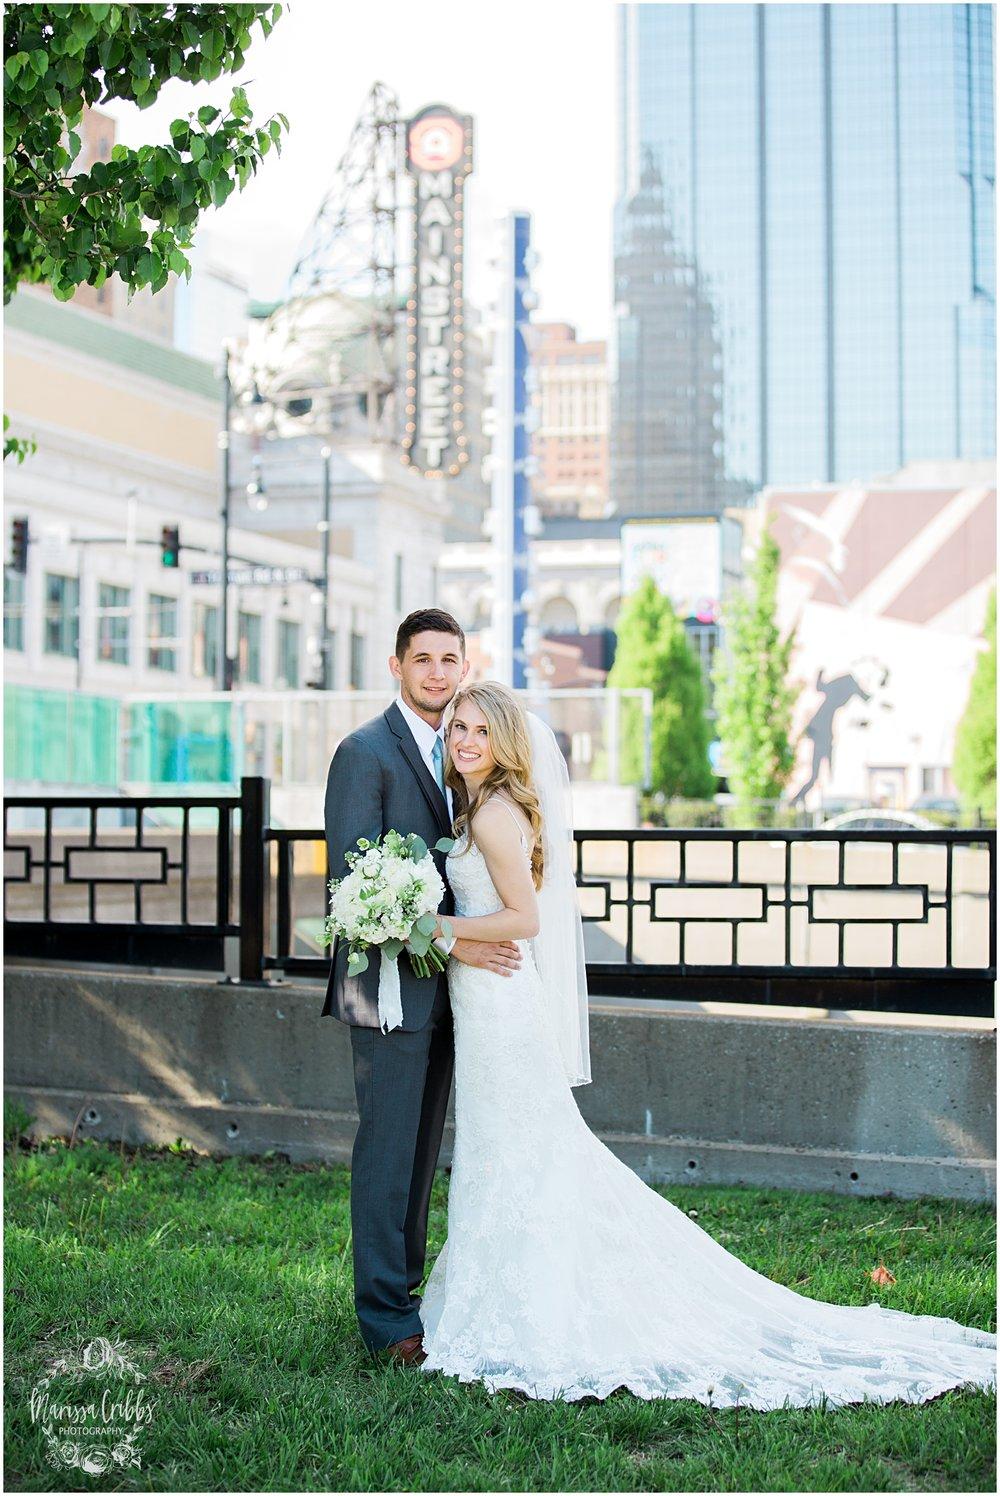 2017 wedding recap | MARISSA CRIBBS PHOTOGRAPHY_4087.jpg